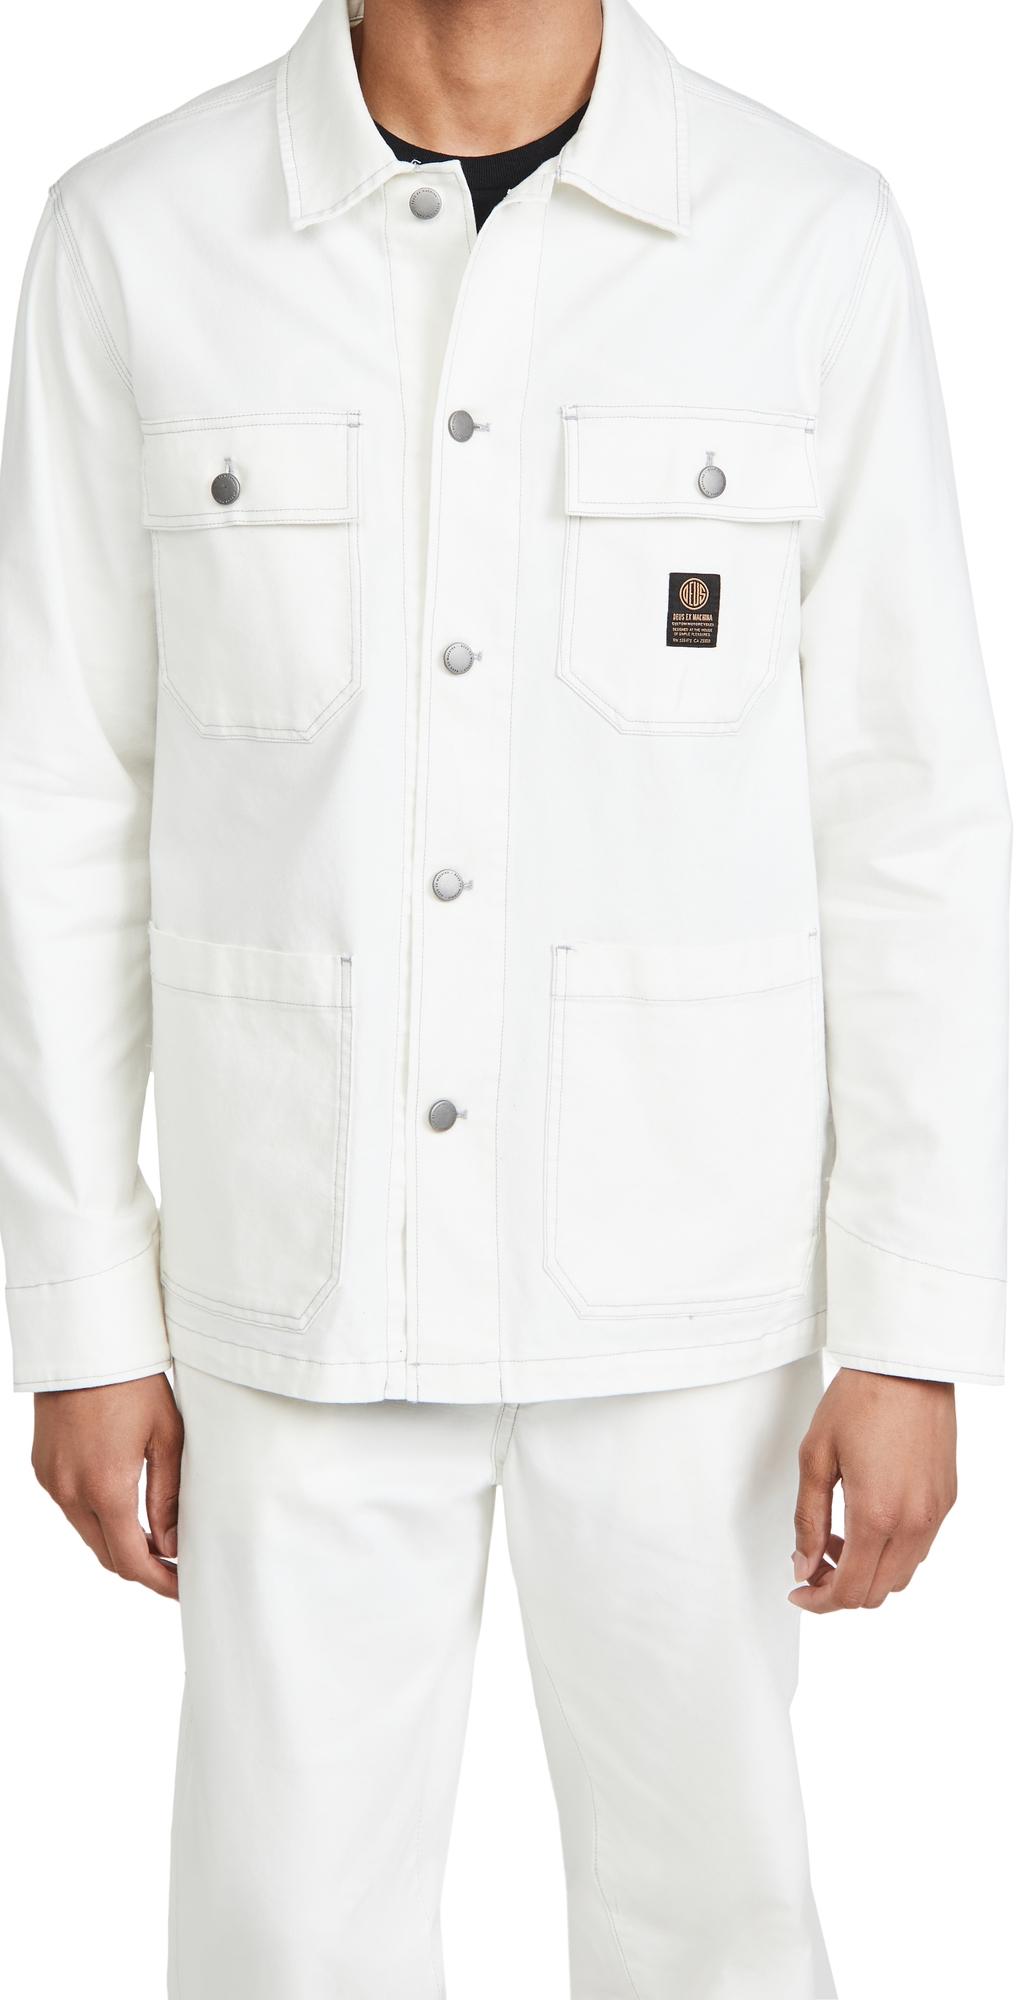 Mac Work Shirt